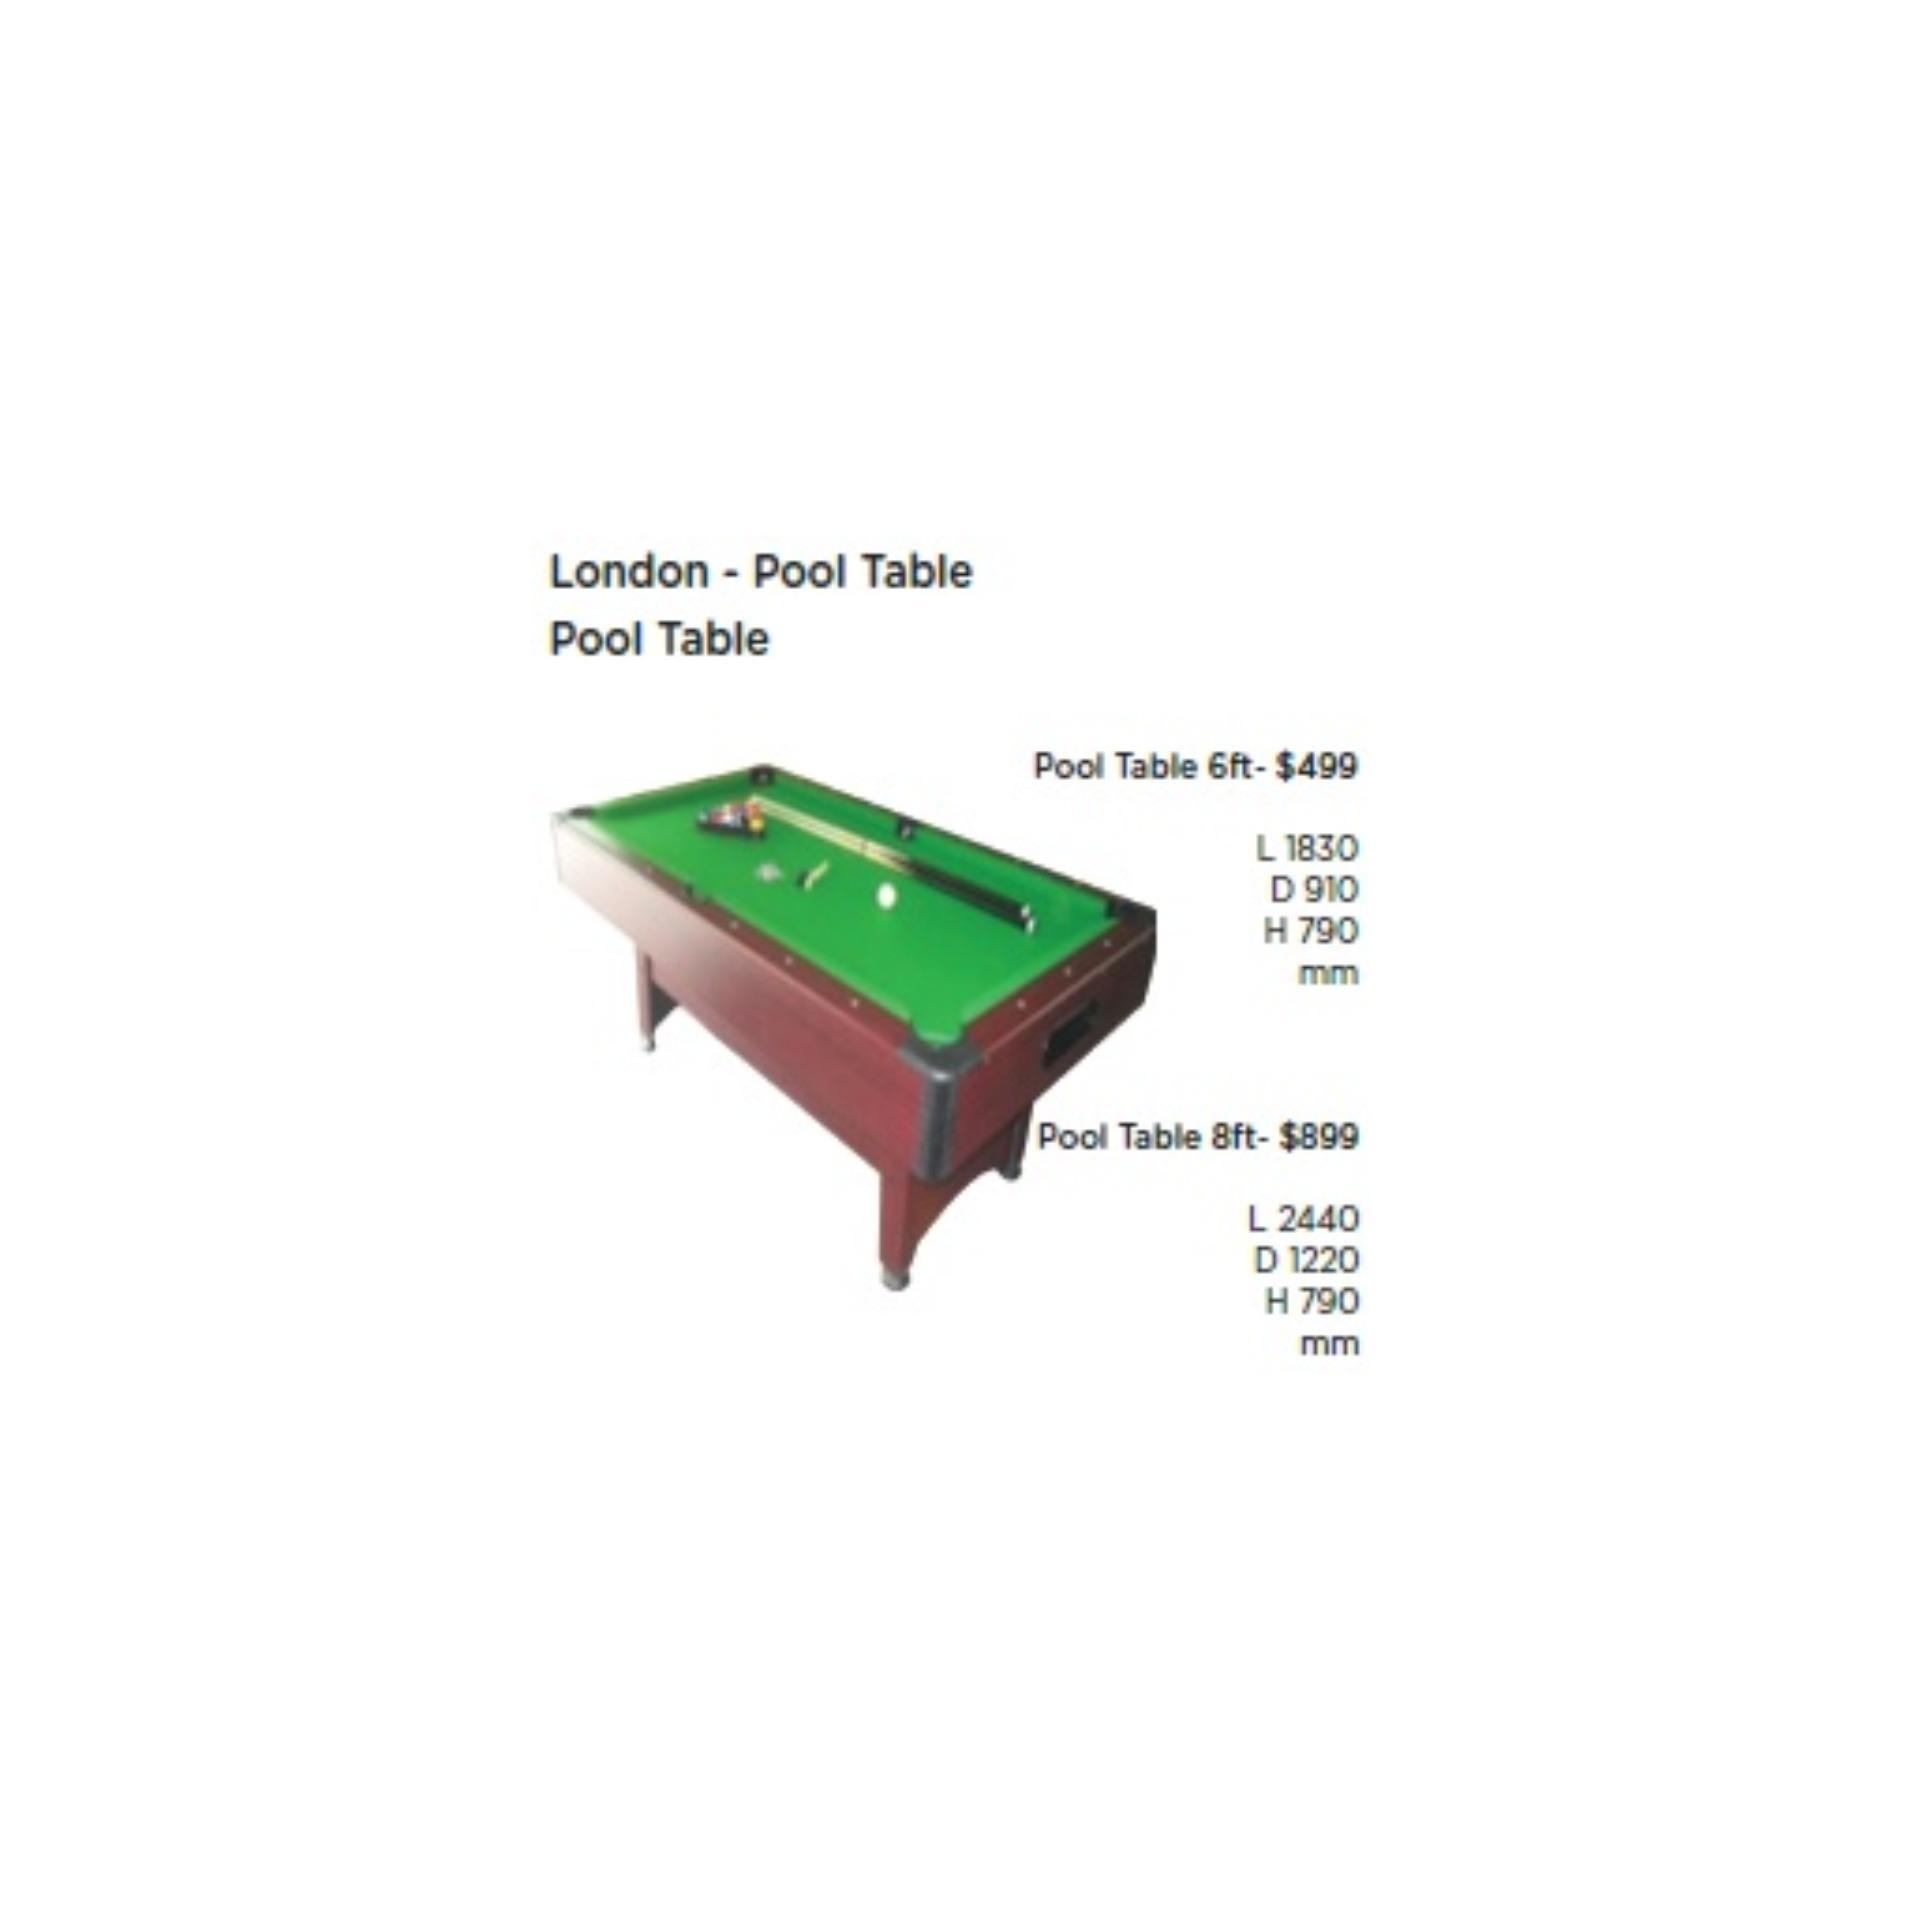 LONDON - POOL TABLE - 6FT